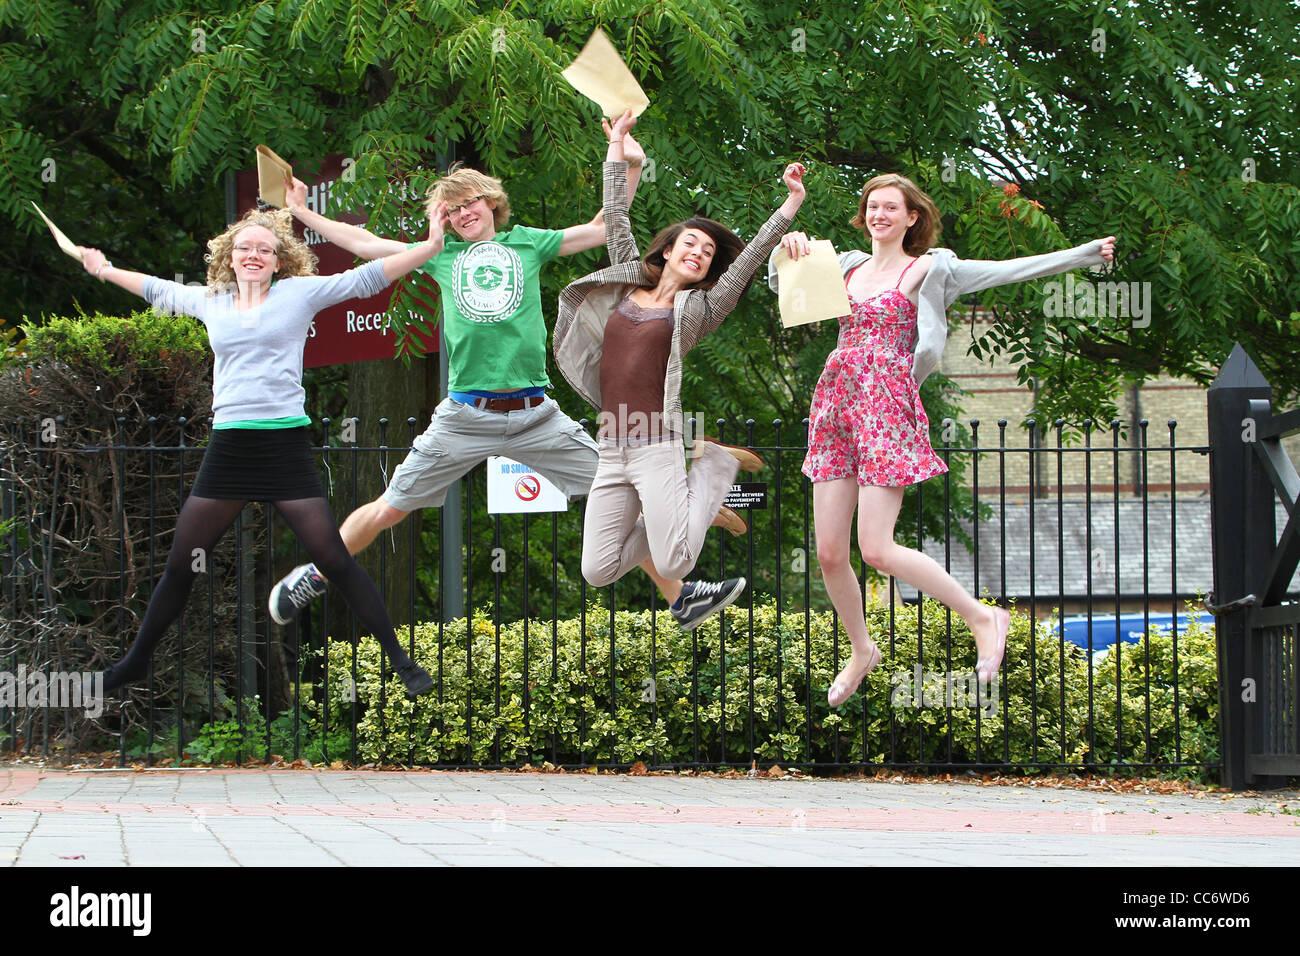 Oberstufe Schüler springen vor Freude am Erhalt ihrer Ende der Begriff Ergebnisse in Cambridge, England Stockbild